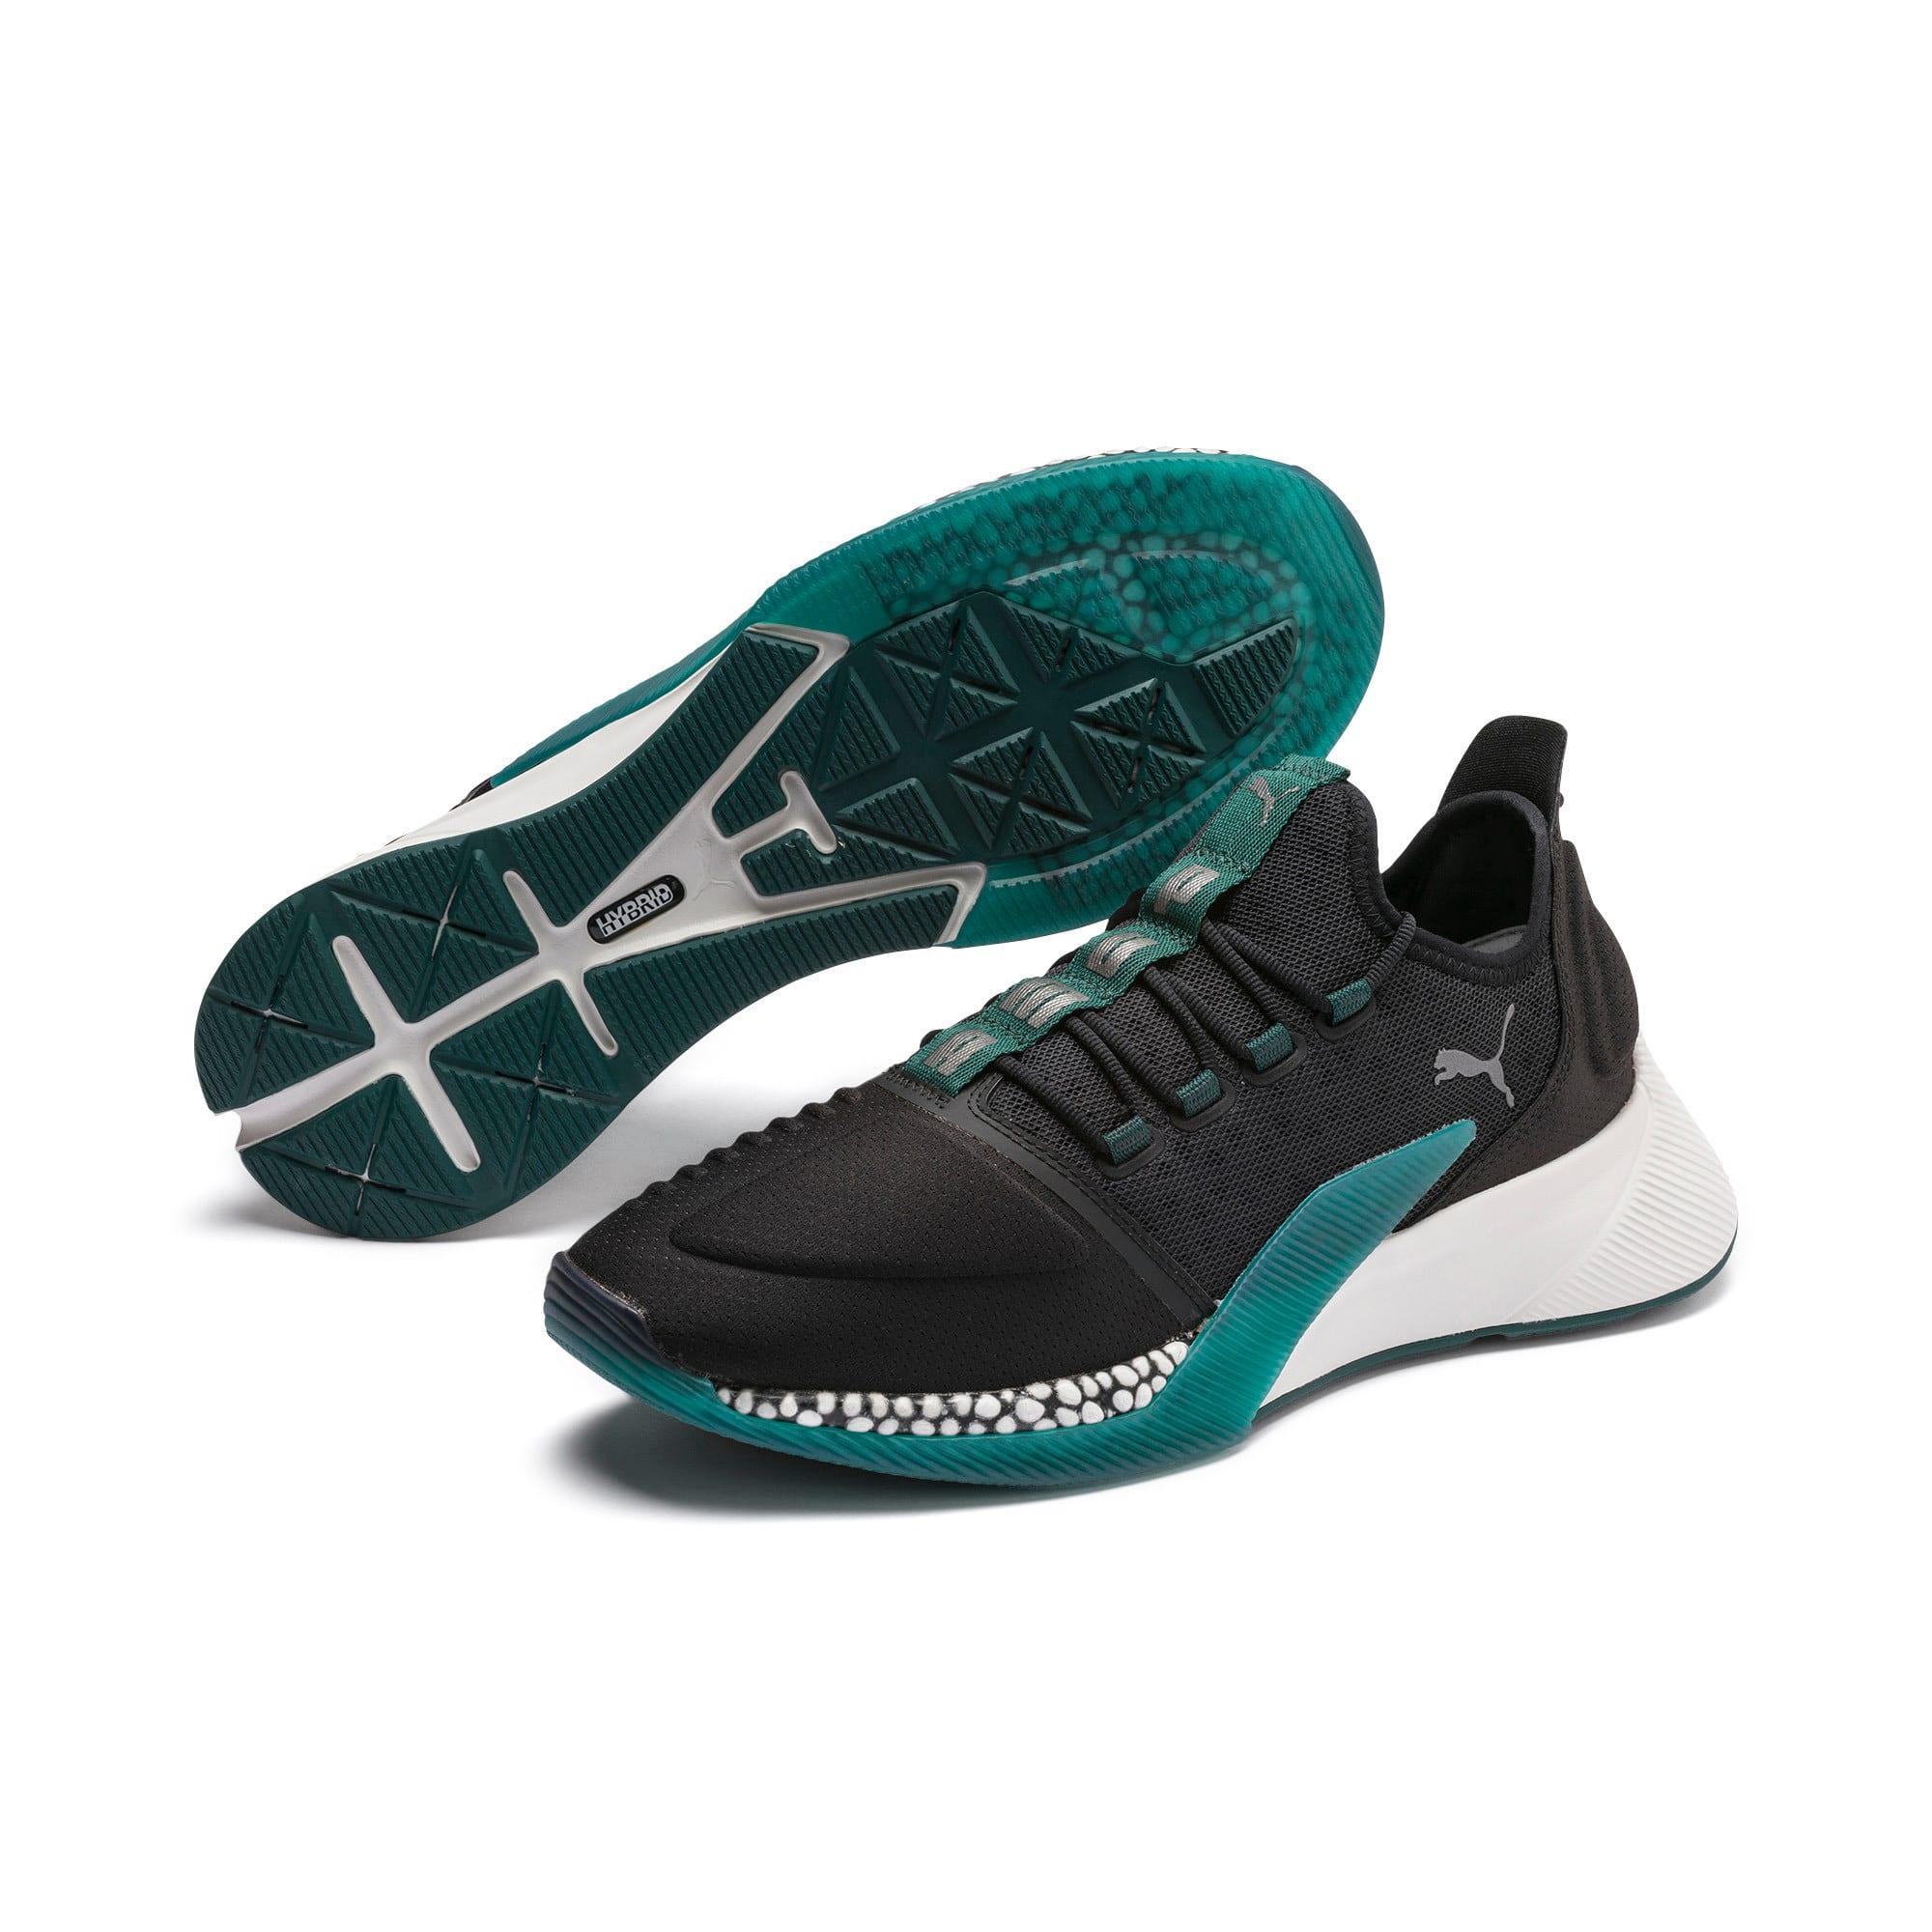 Thumbnail 3 of Xcelerator Men's Sneakers, Black-Glacier Gray-Ponderosa, medium